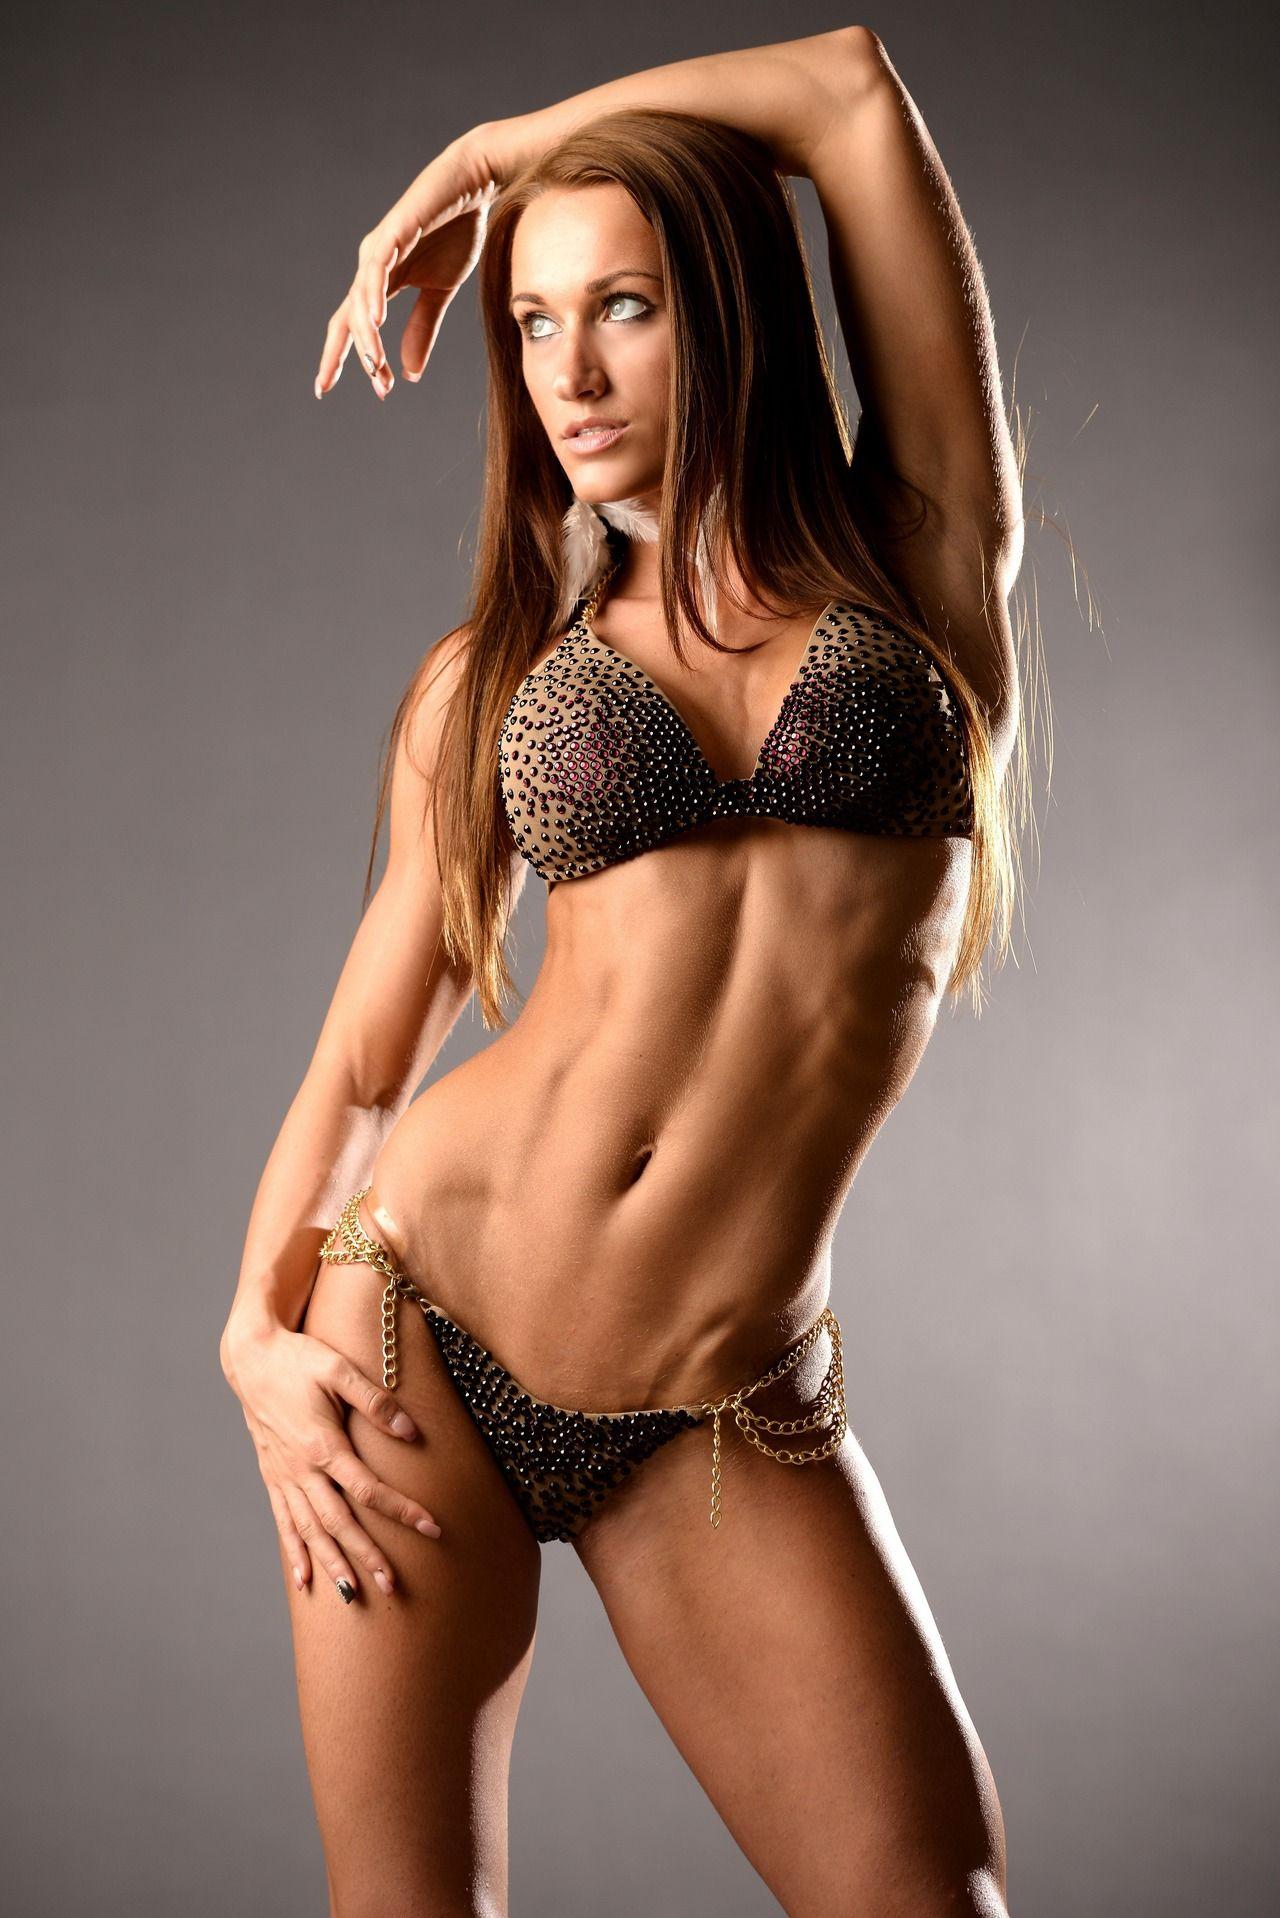 Female Form #StrongIsBeautiful #Motivation #WomenLift2 dia salamon ...